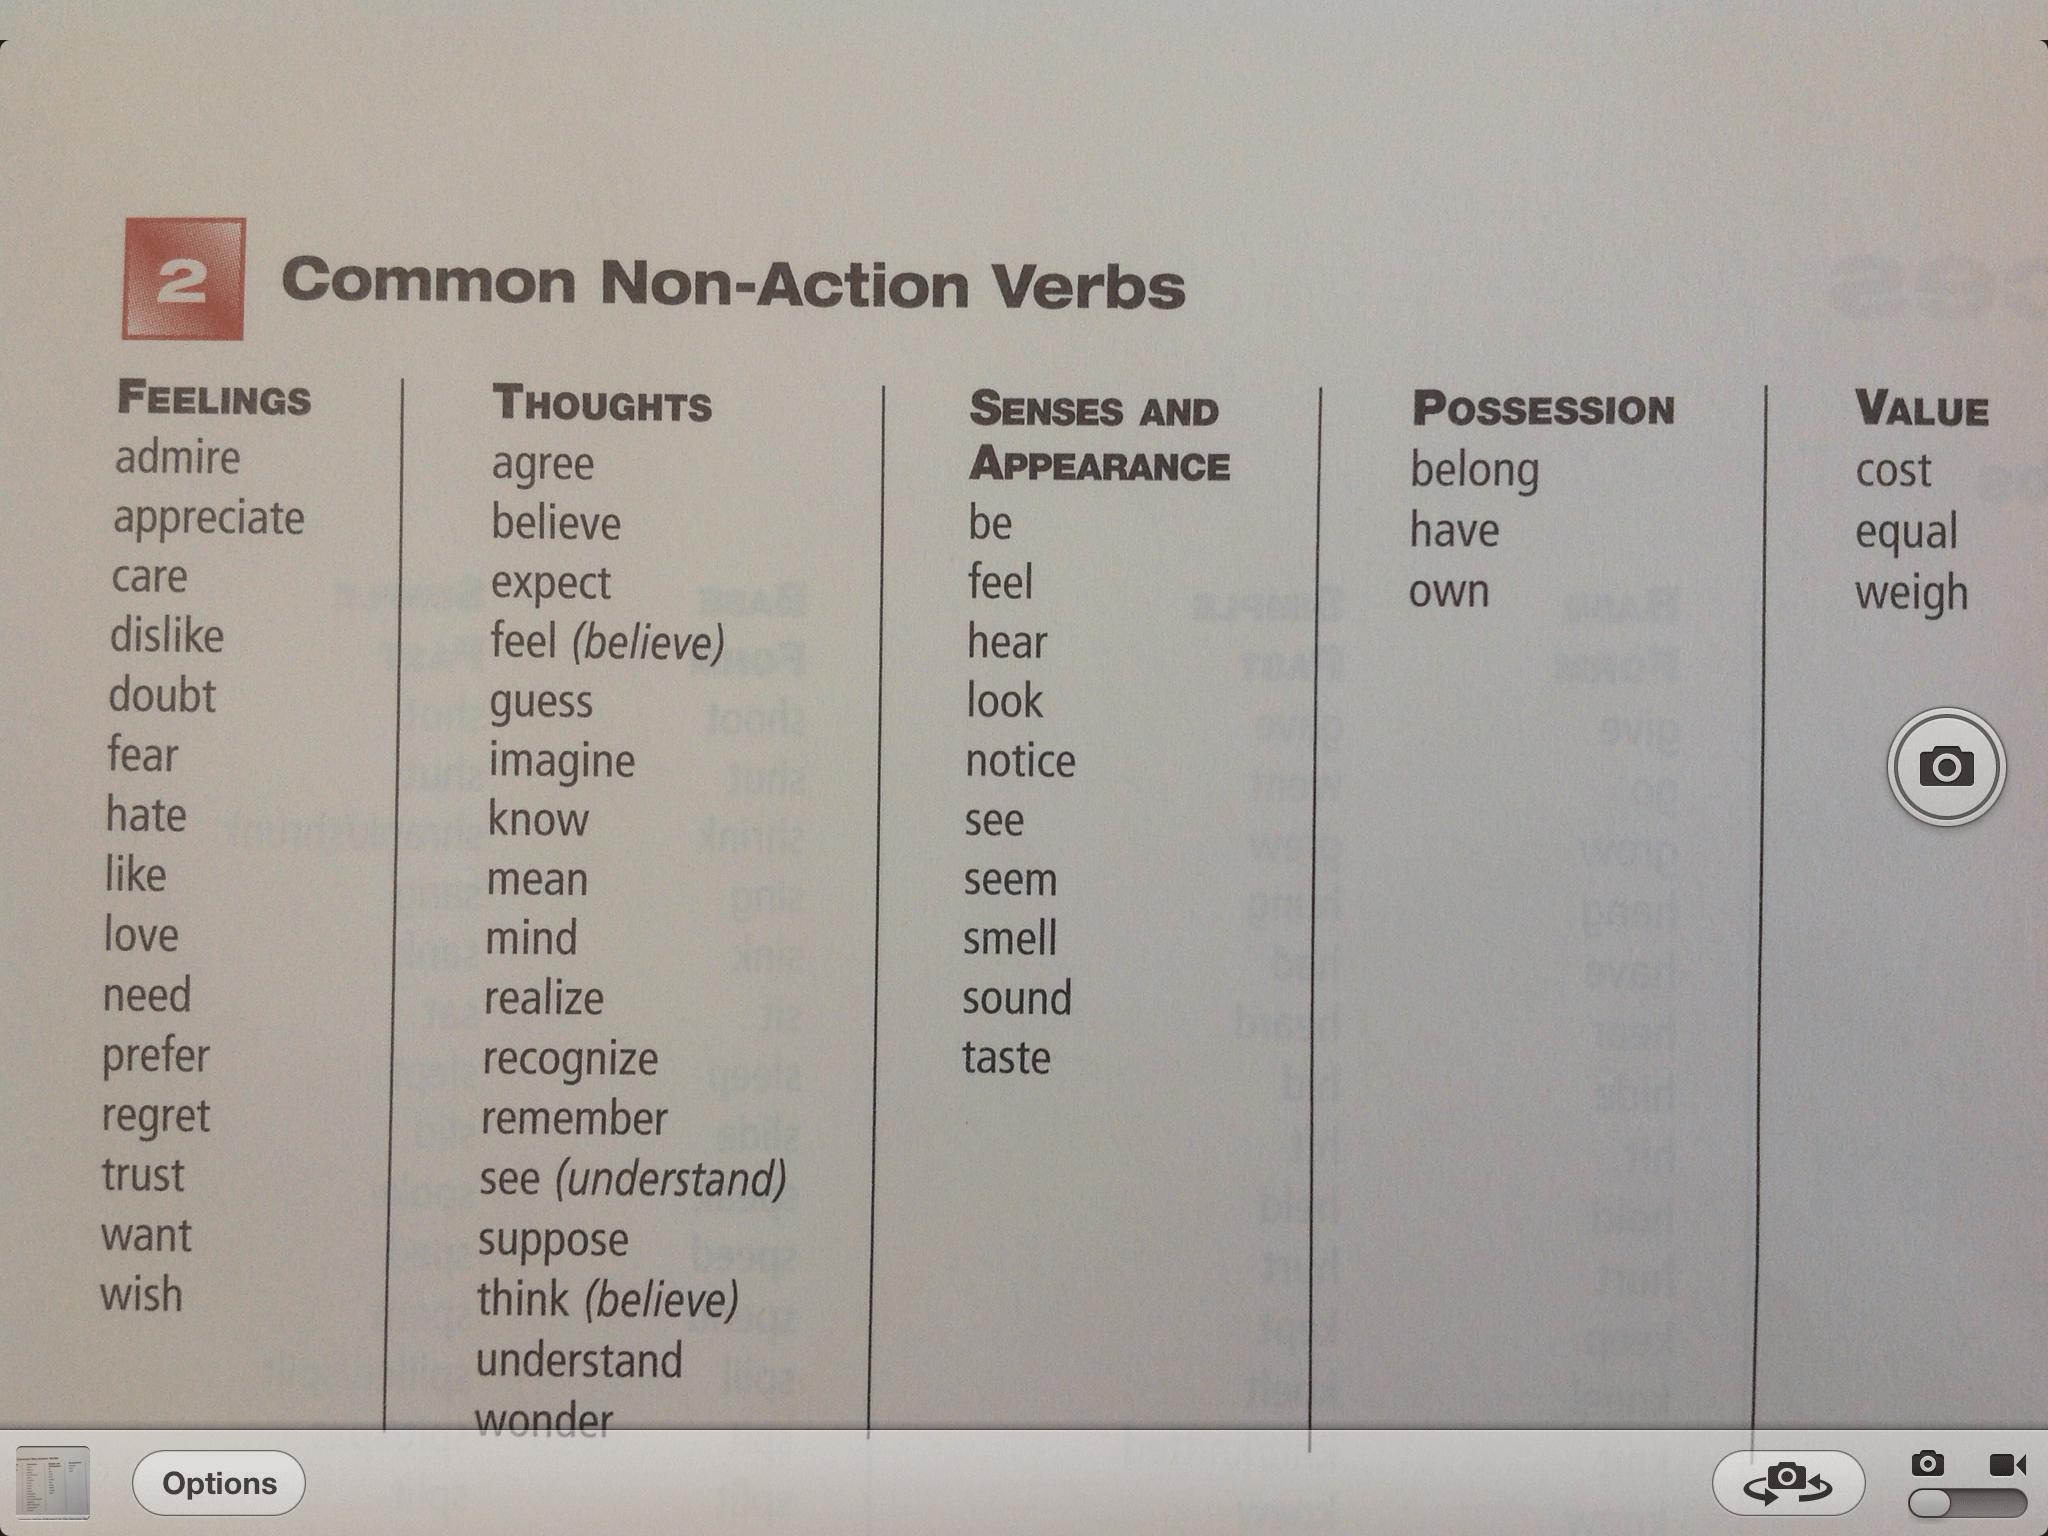 Resume Active Verbs List Resume Action Verbs List Microsoft Word  Active Verbs List